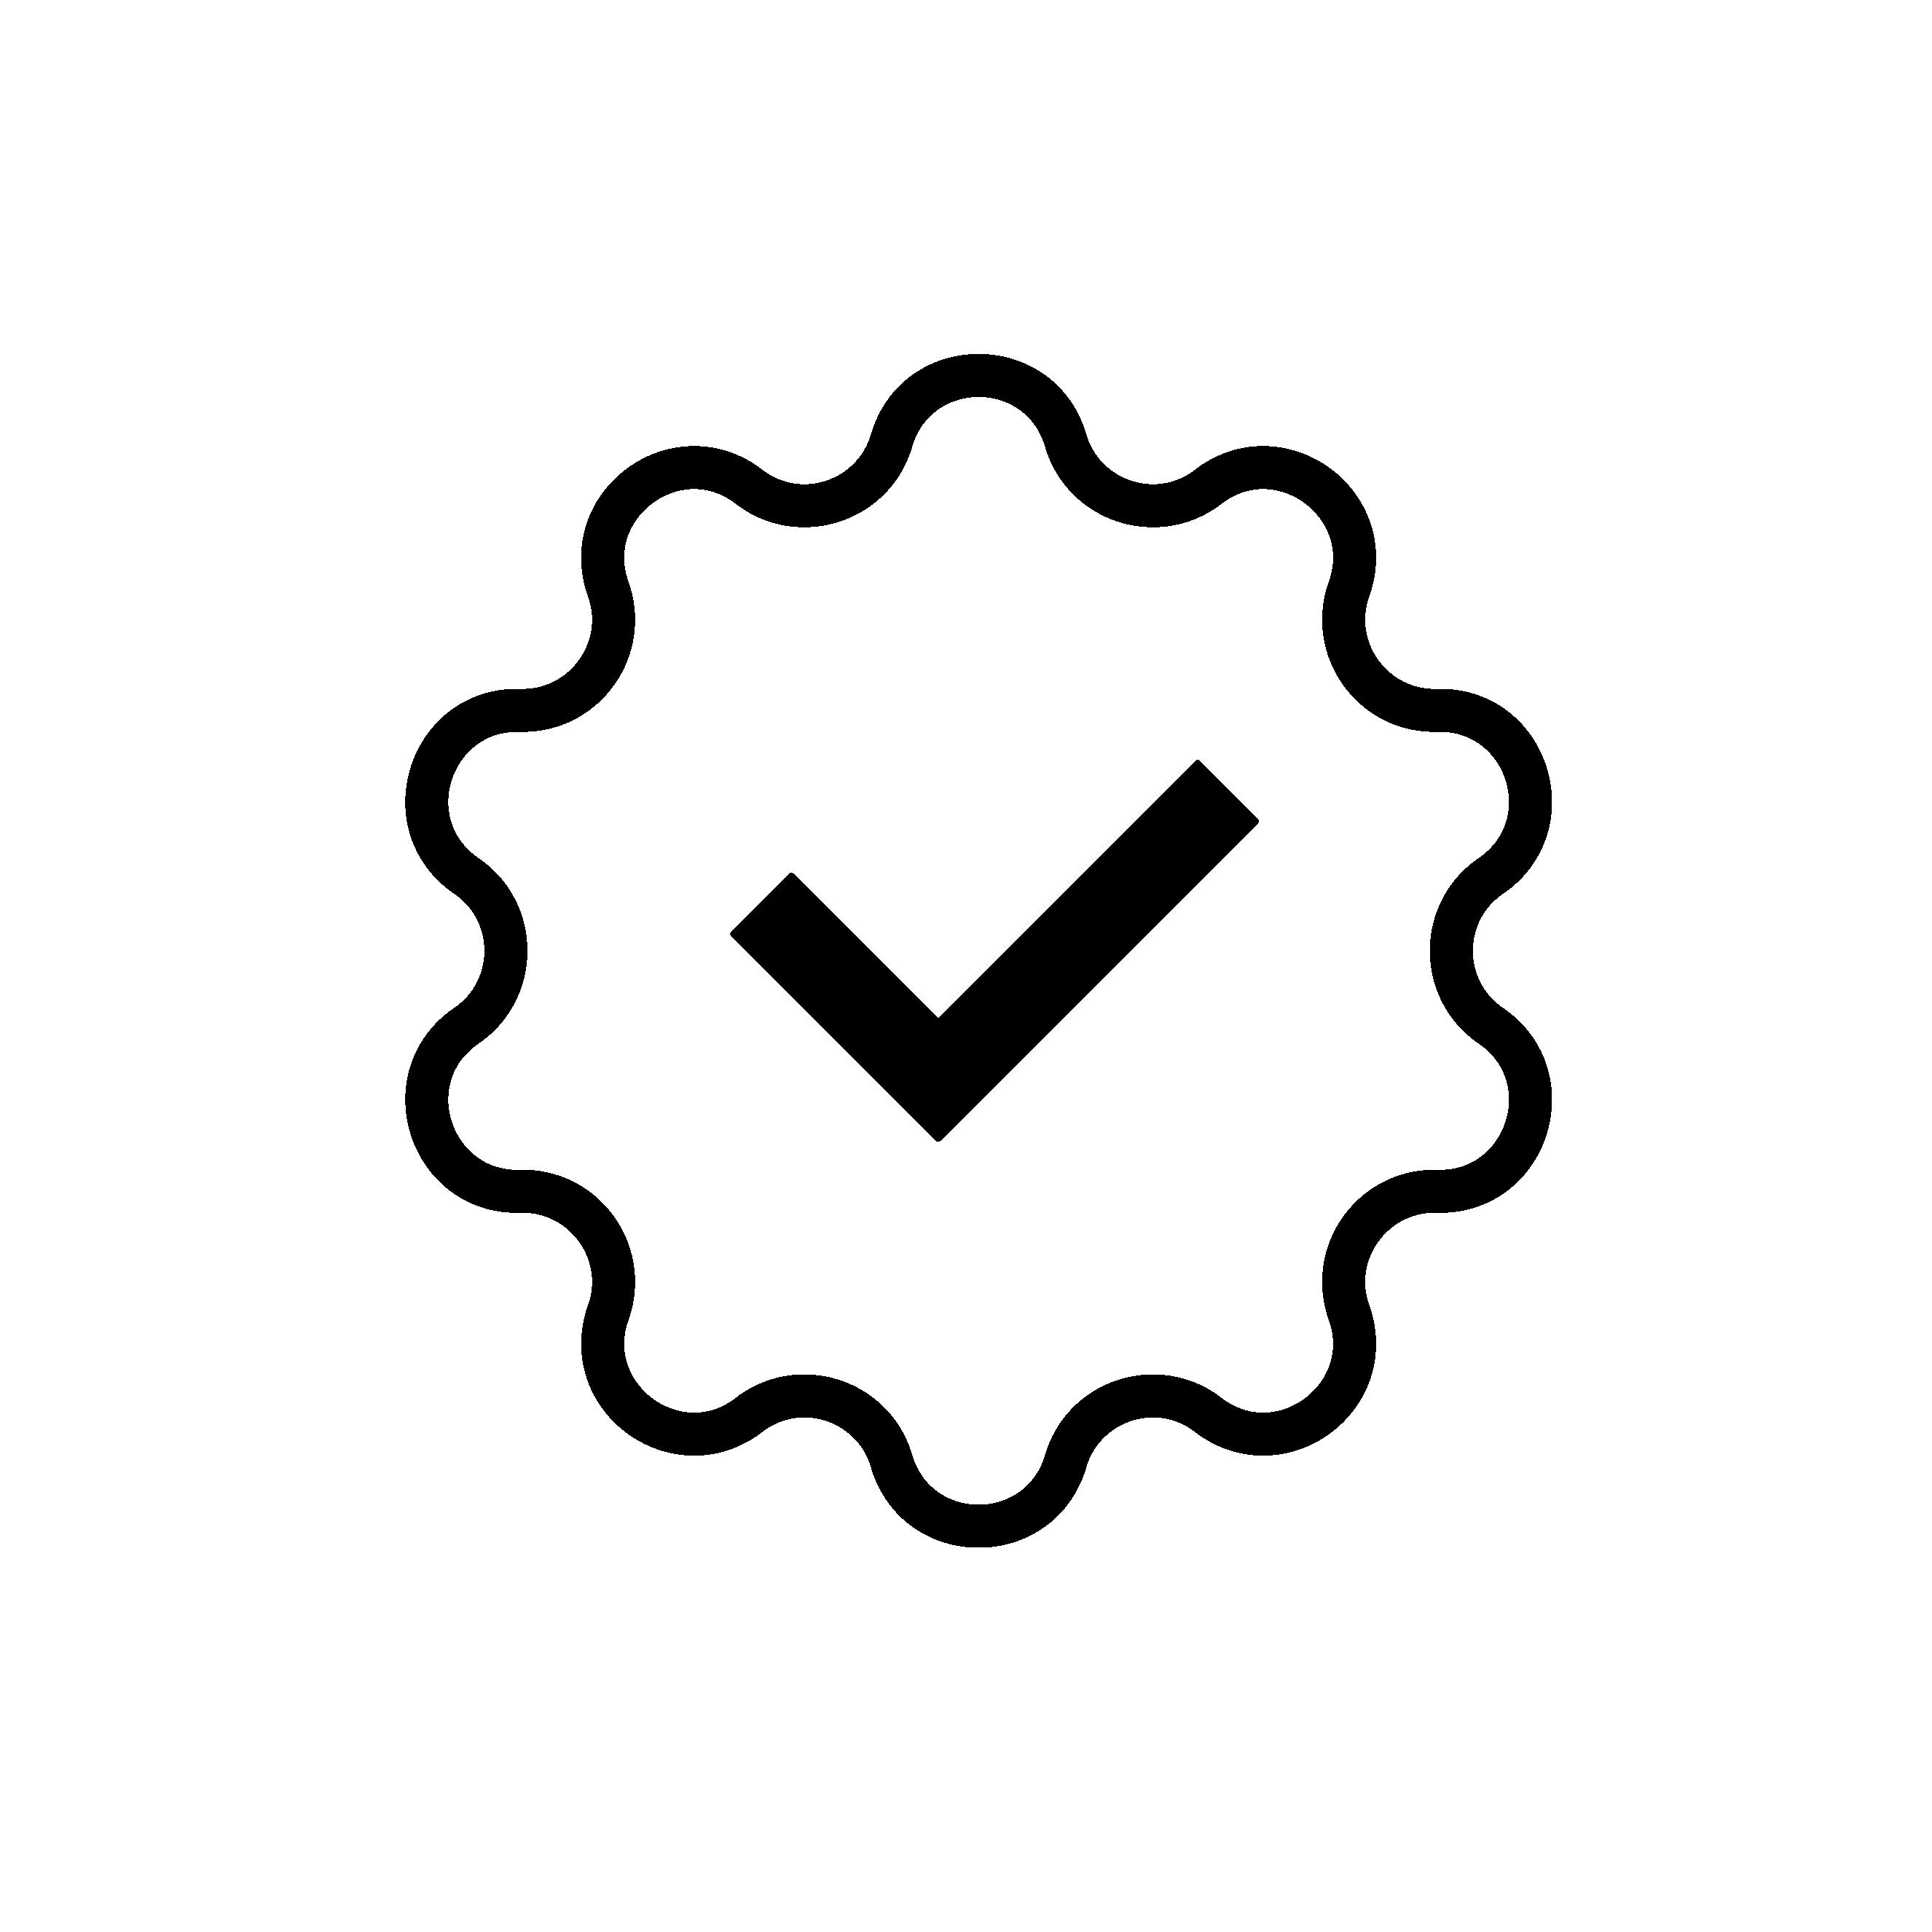 Symbol Kvalitetssikring